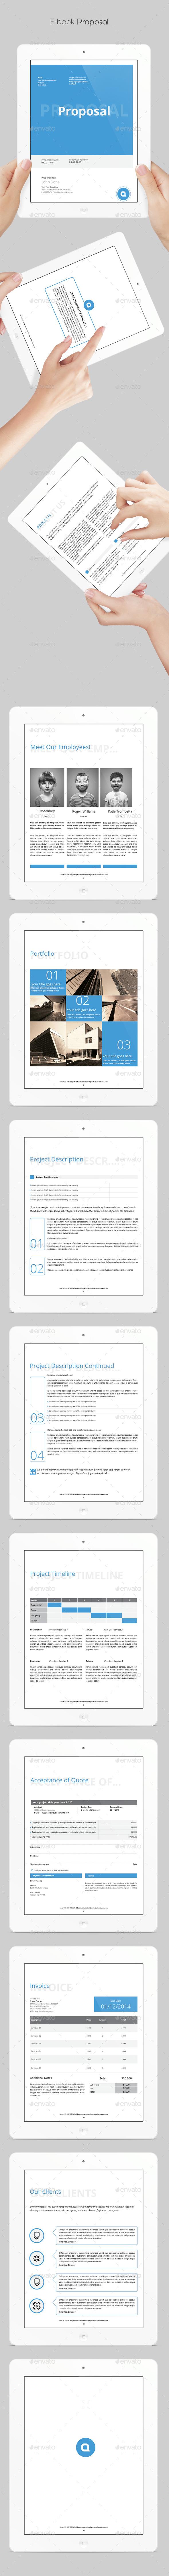 E-book Proposal - Digital Books ePublishing